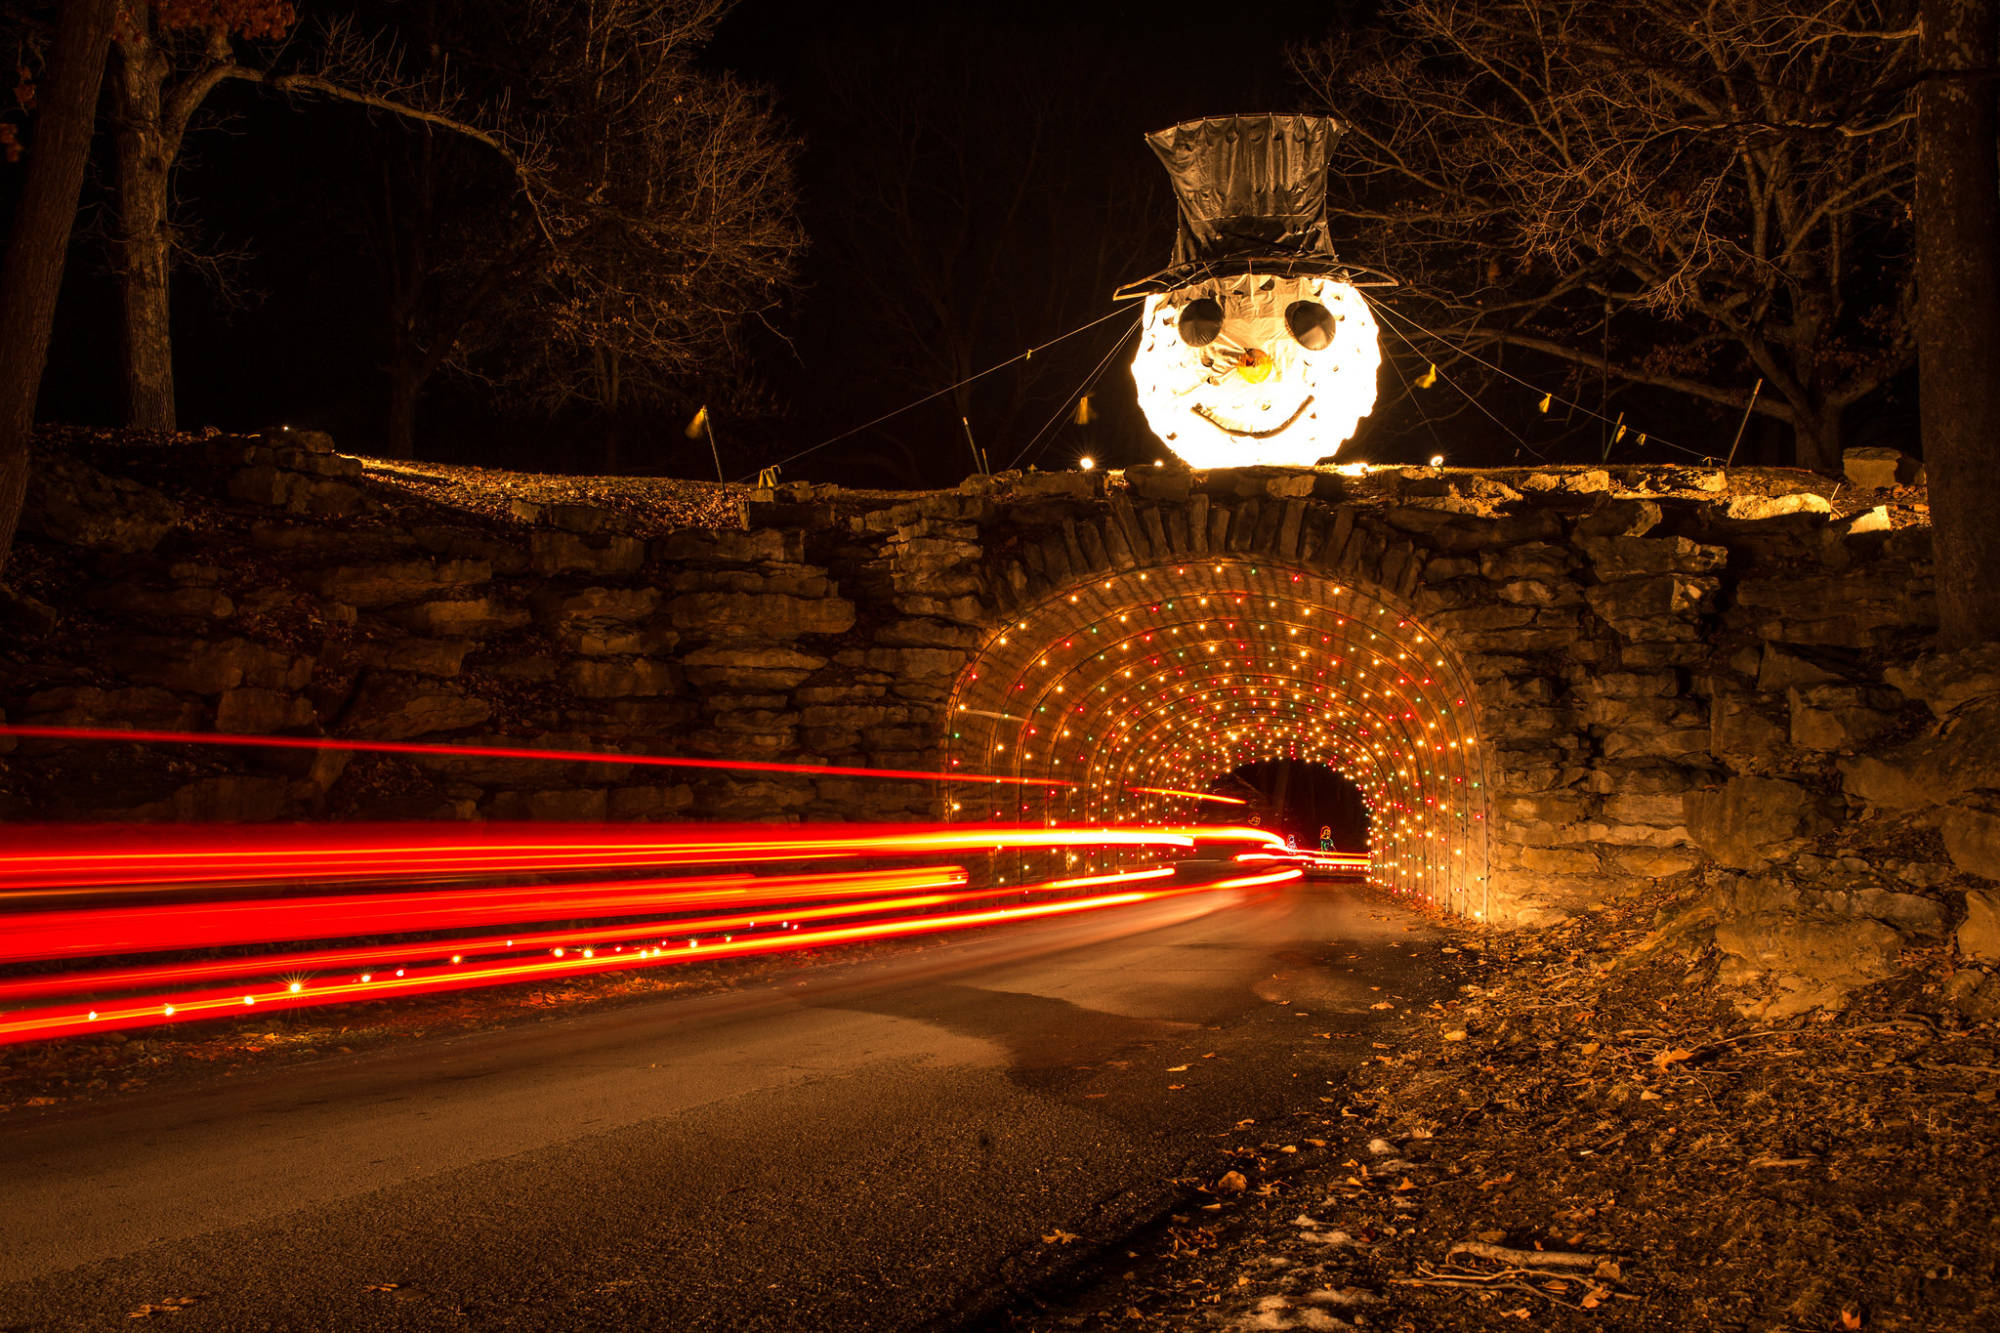 Krug Park St Joseph Mo Christmas Lights 2021 See The Light In St Joseph Uncommon Character St Joseph Mo